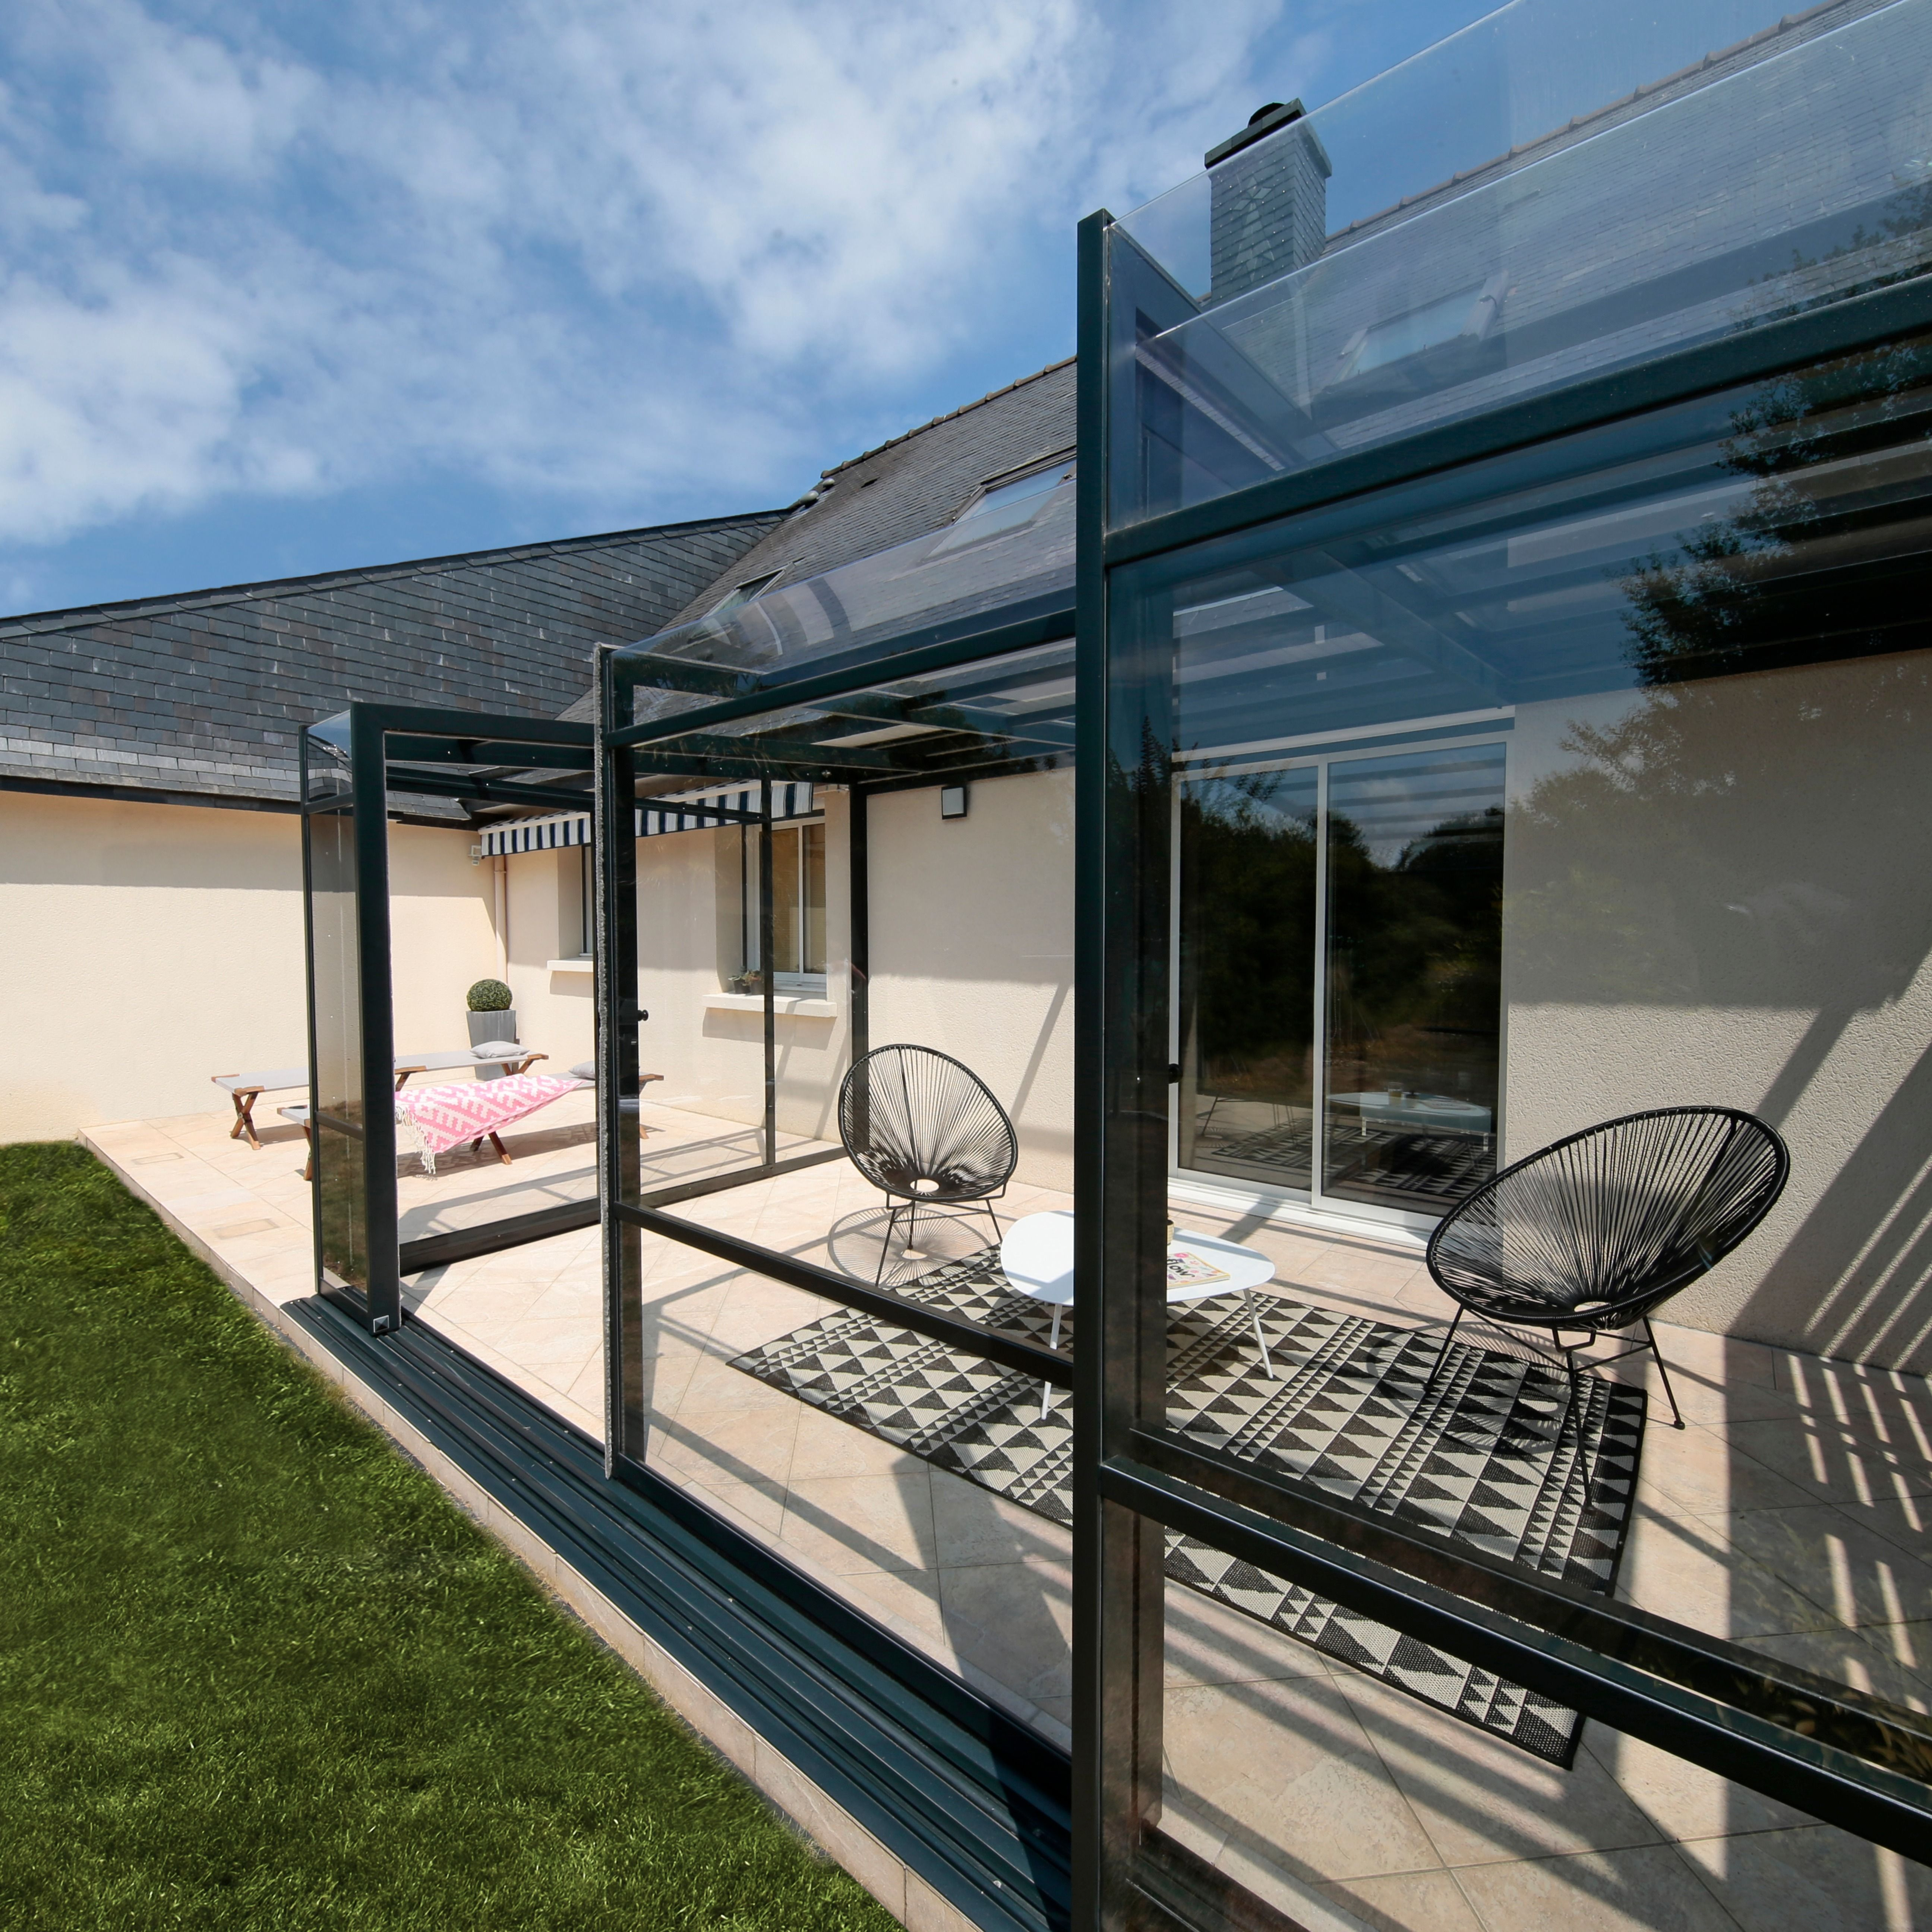 Abri Terrasse Aluminium Modeles Coulissants Telescopiques Renoval En 2020 Abri Terrasse Terrasse Abri